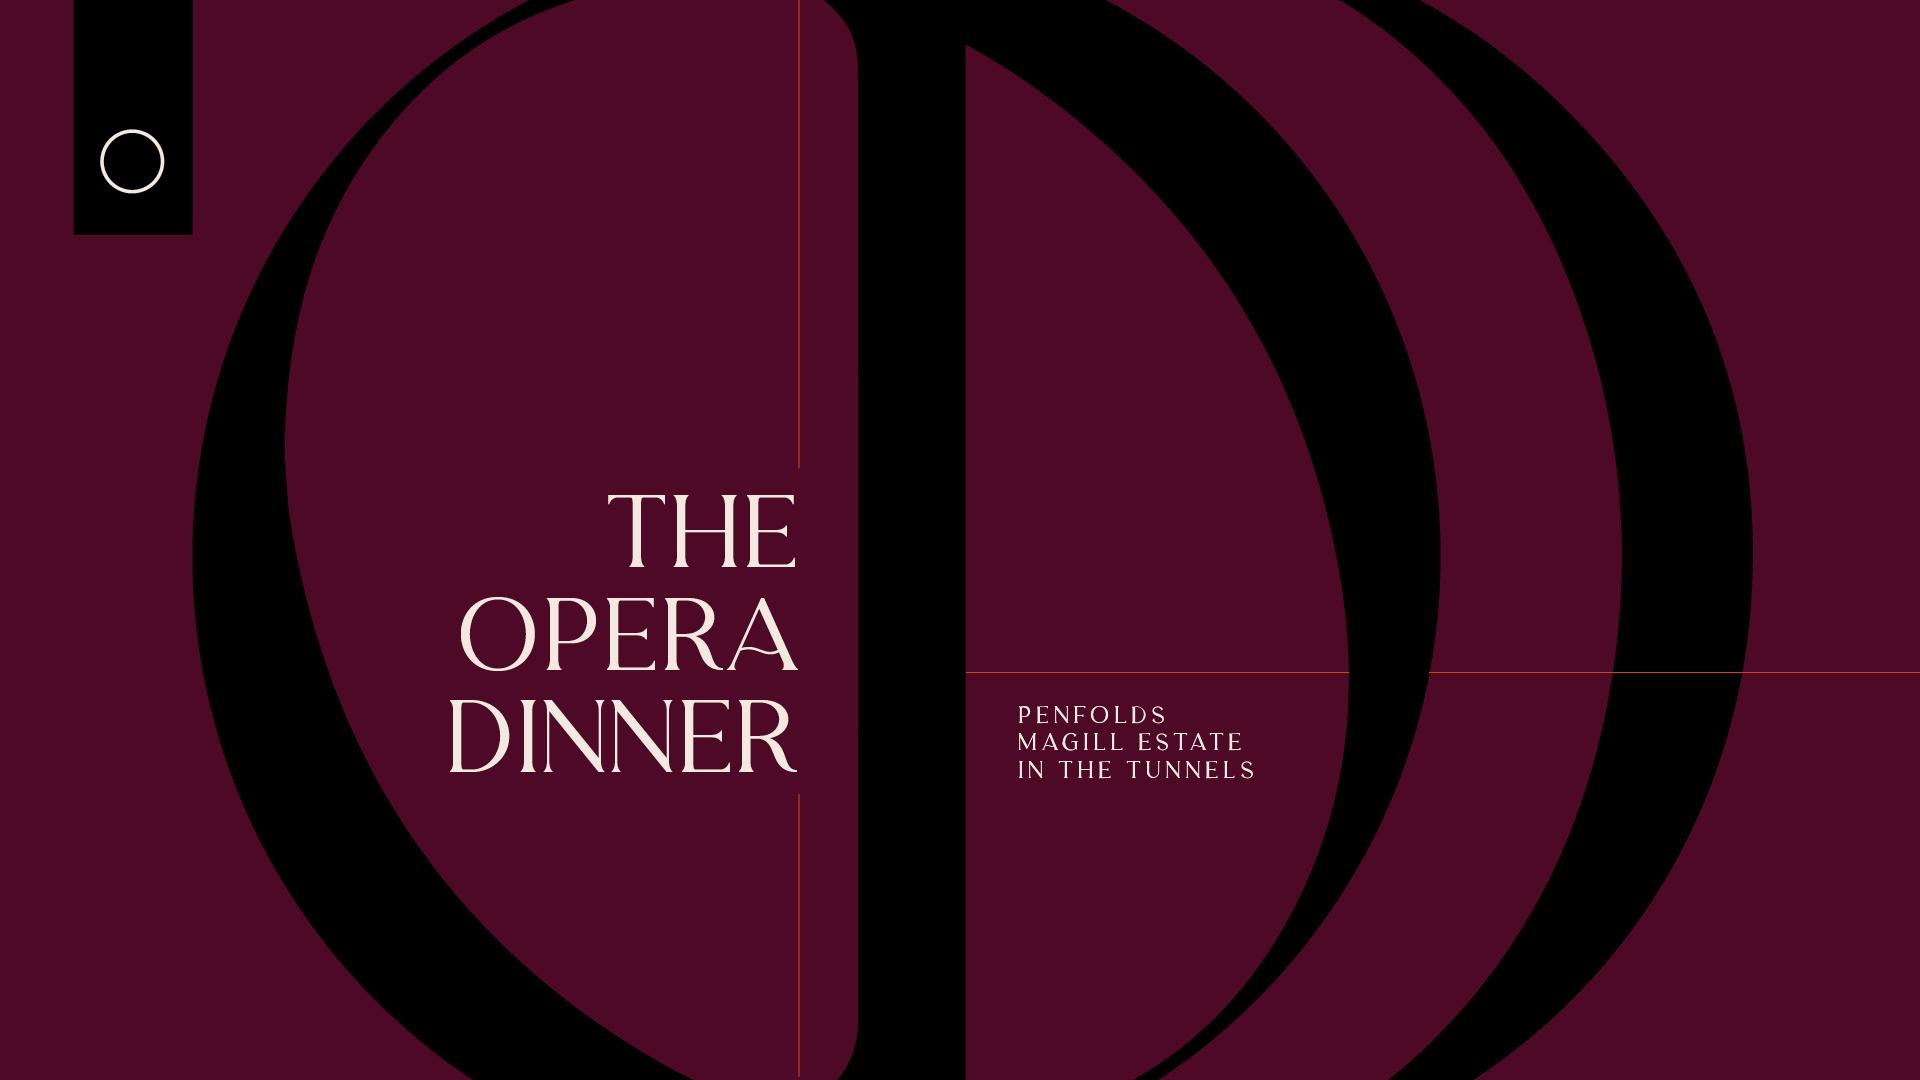 https://stateopera.com.au/wp-content/uploads/2021/10/SOS0061_Opera-Dinner-Invite_v04_A-1.jpg